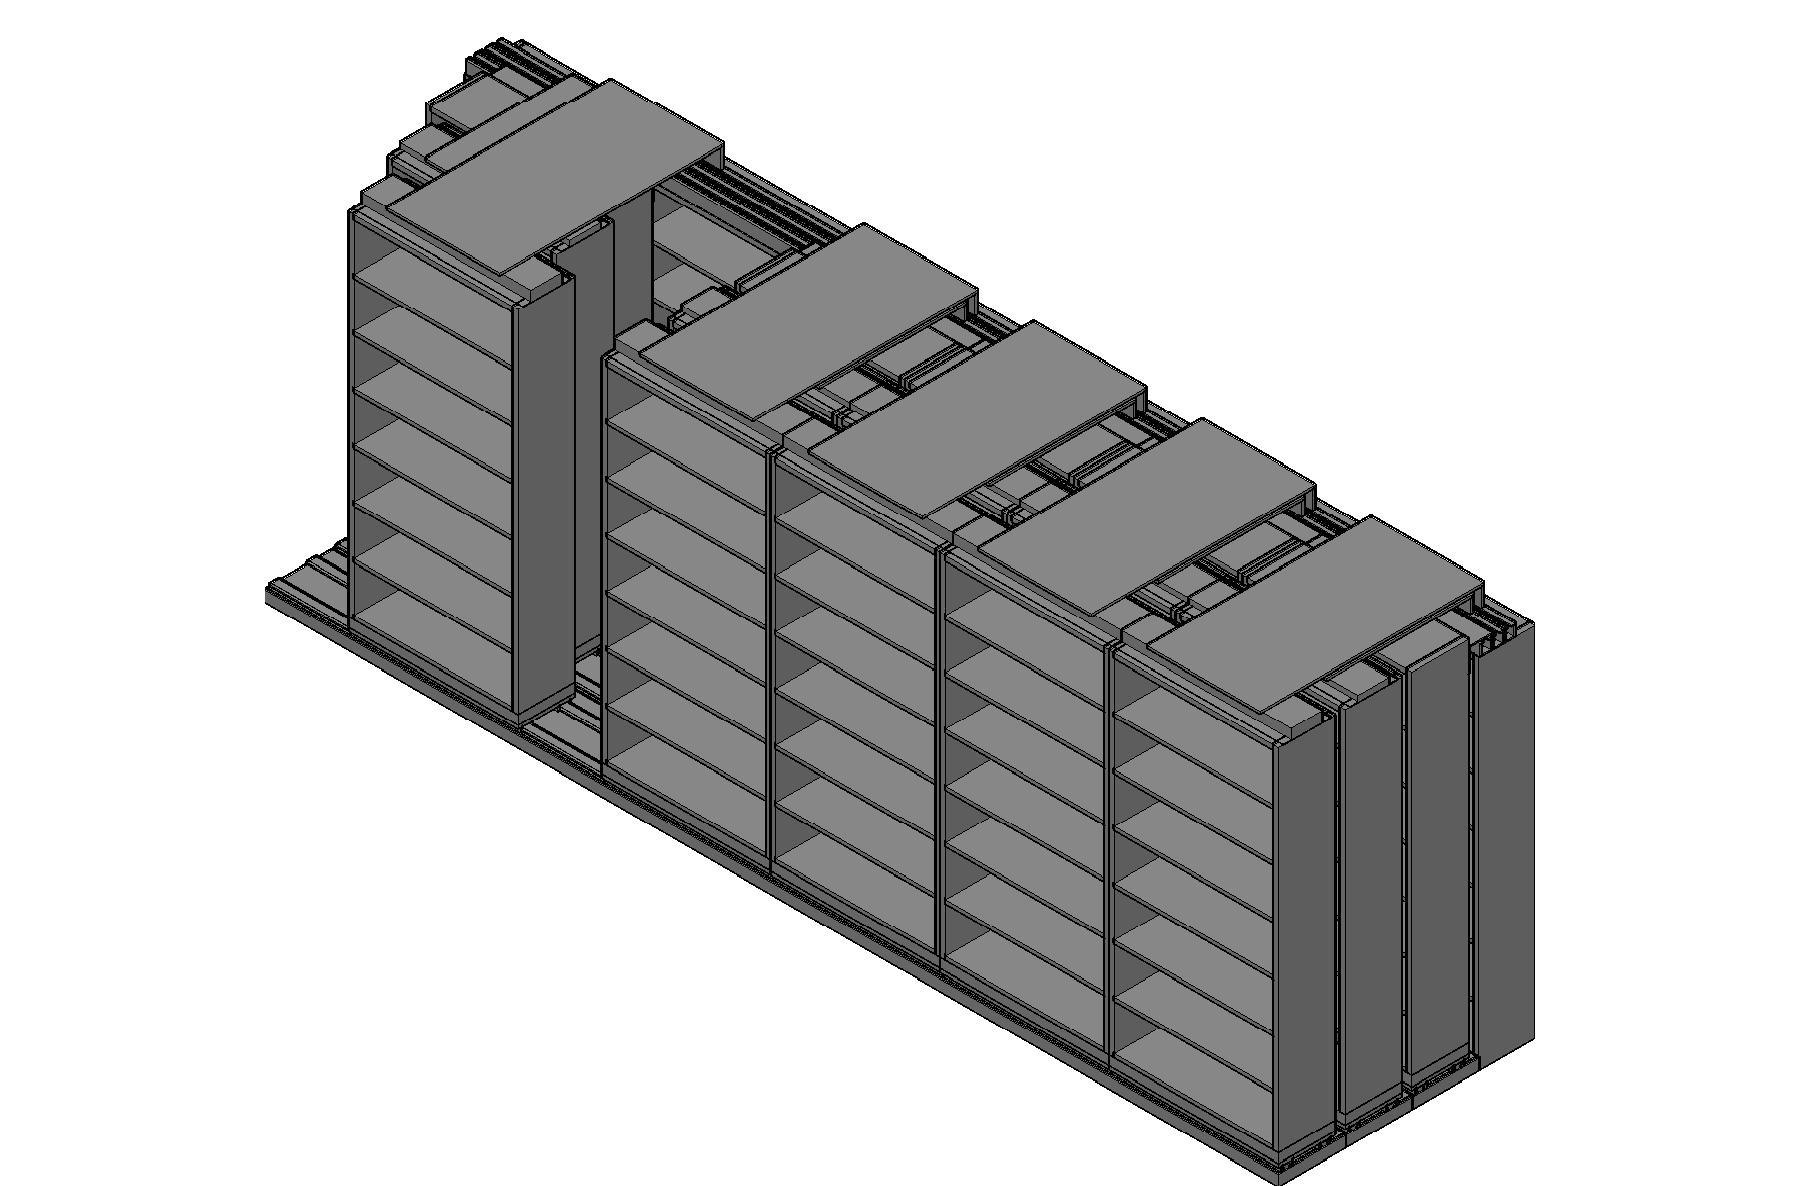 "Letter Size Sliding Shelves - 4 Rows Deep - 7 Levels - (36"" x 12"" Shelves) - 220"" Total Width"